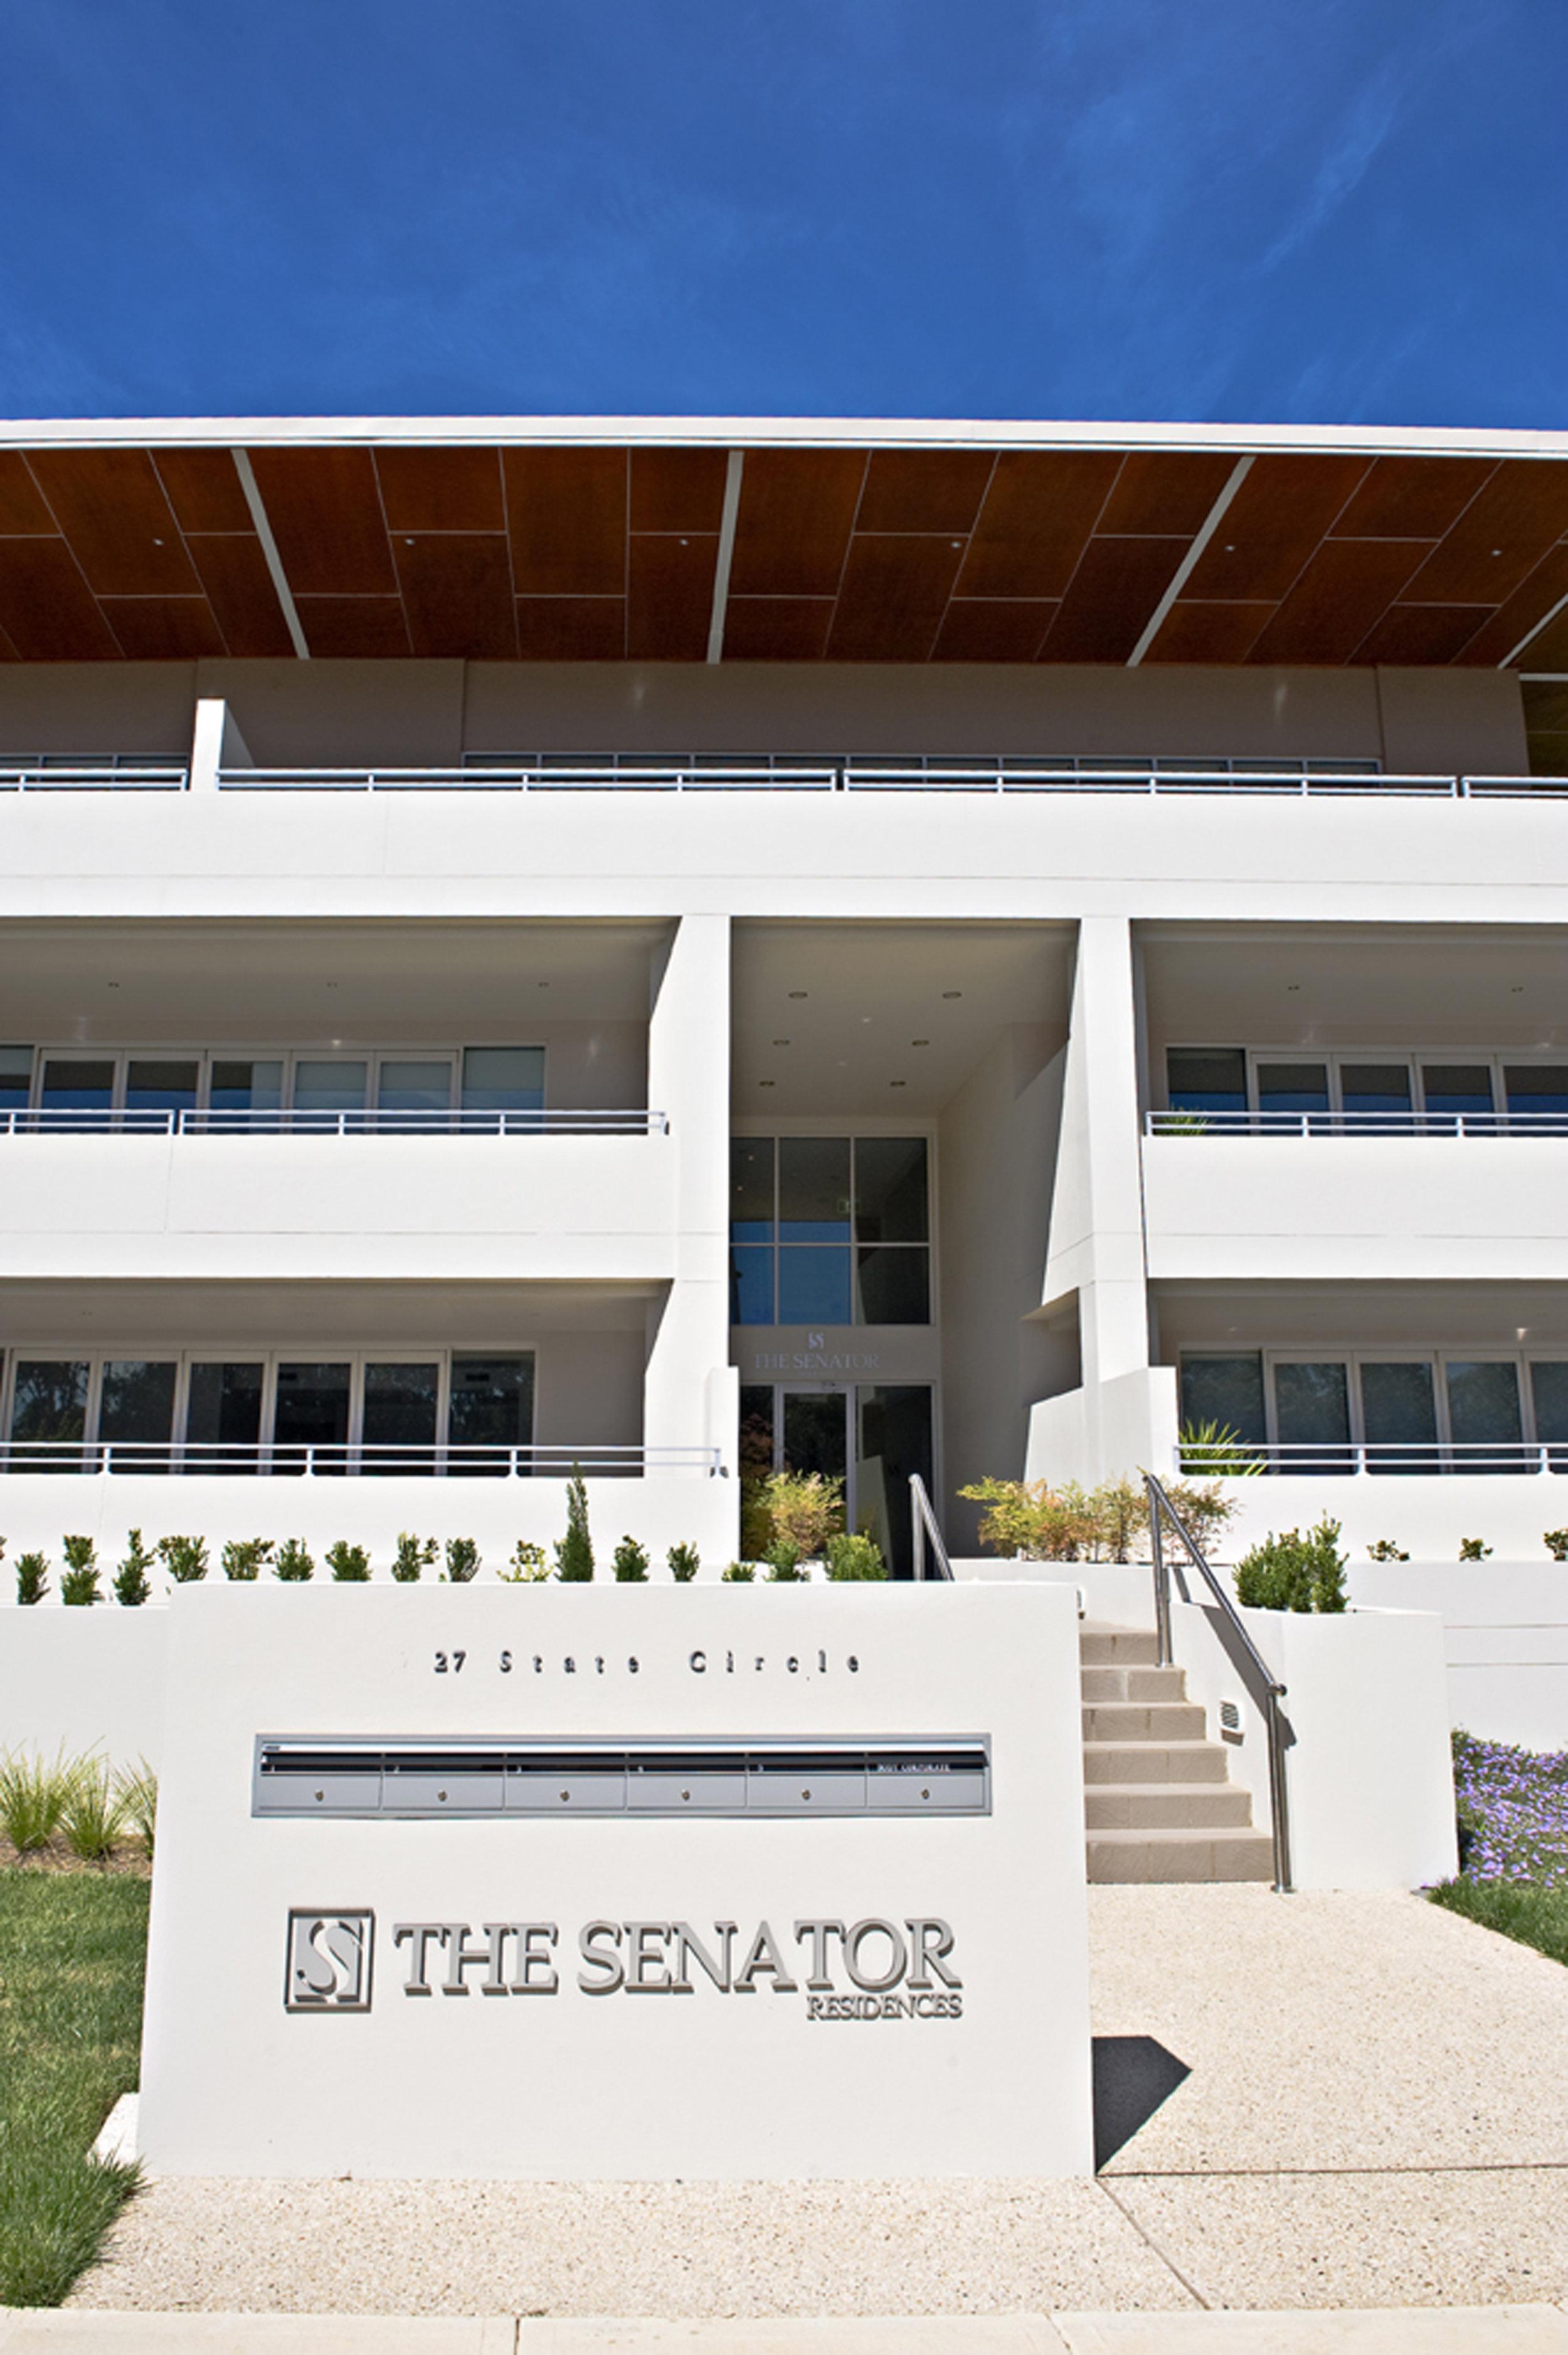 The Senator Residences External view (2).jpg